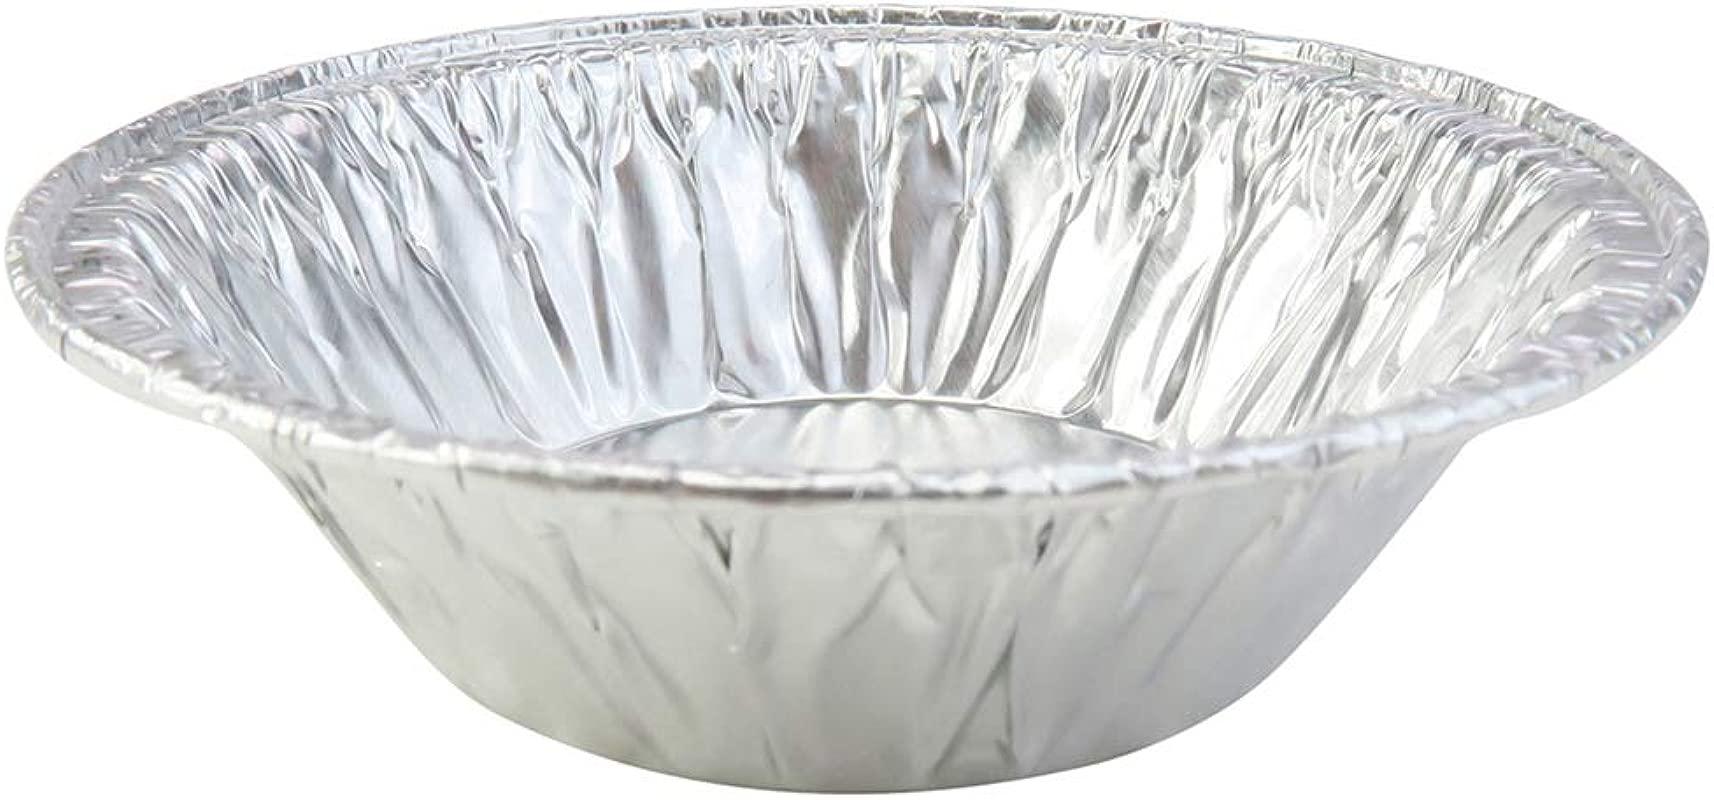 Disposable Aluminum 3 Tart Pans Individual Pie Pans 301 100